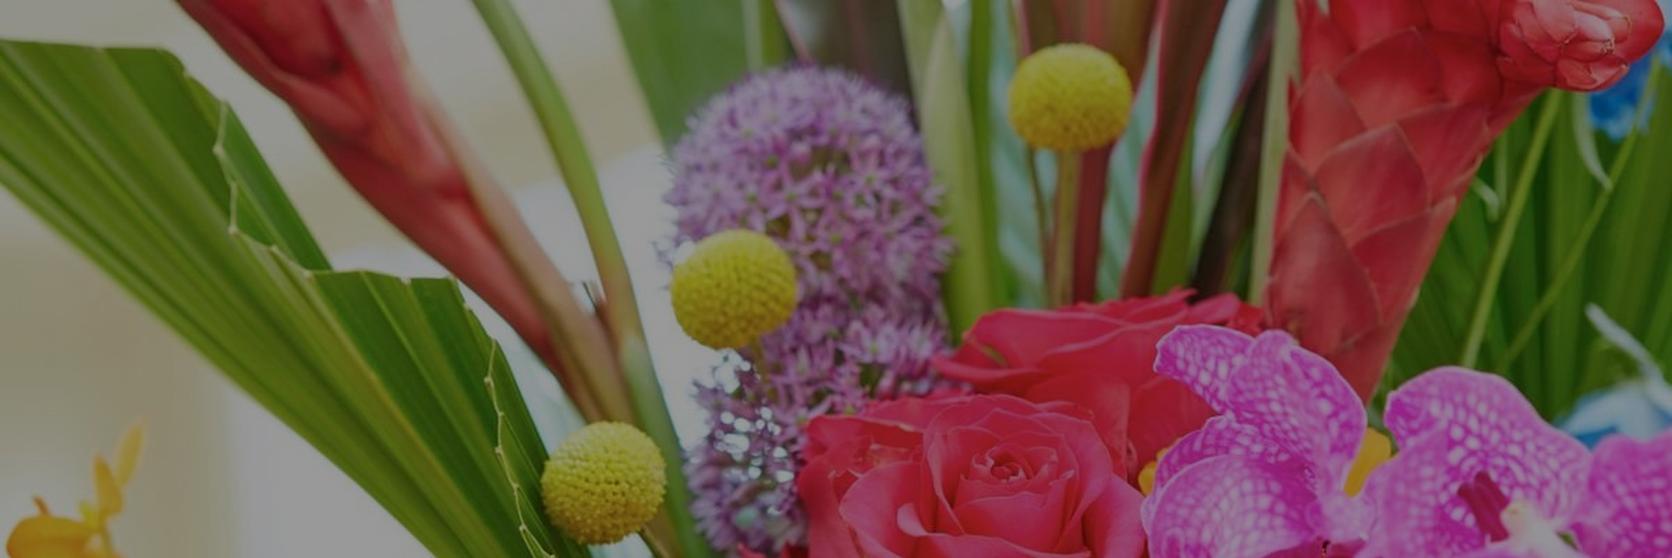 InfloPR030416-7V4A0828-summer-wedding-ideas